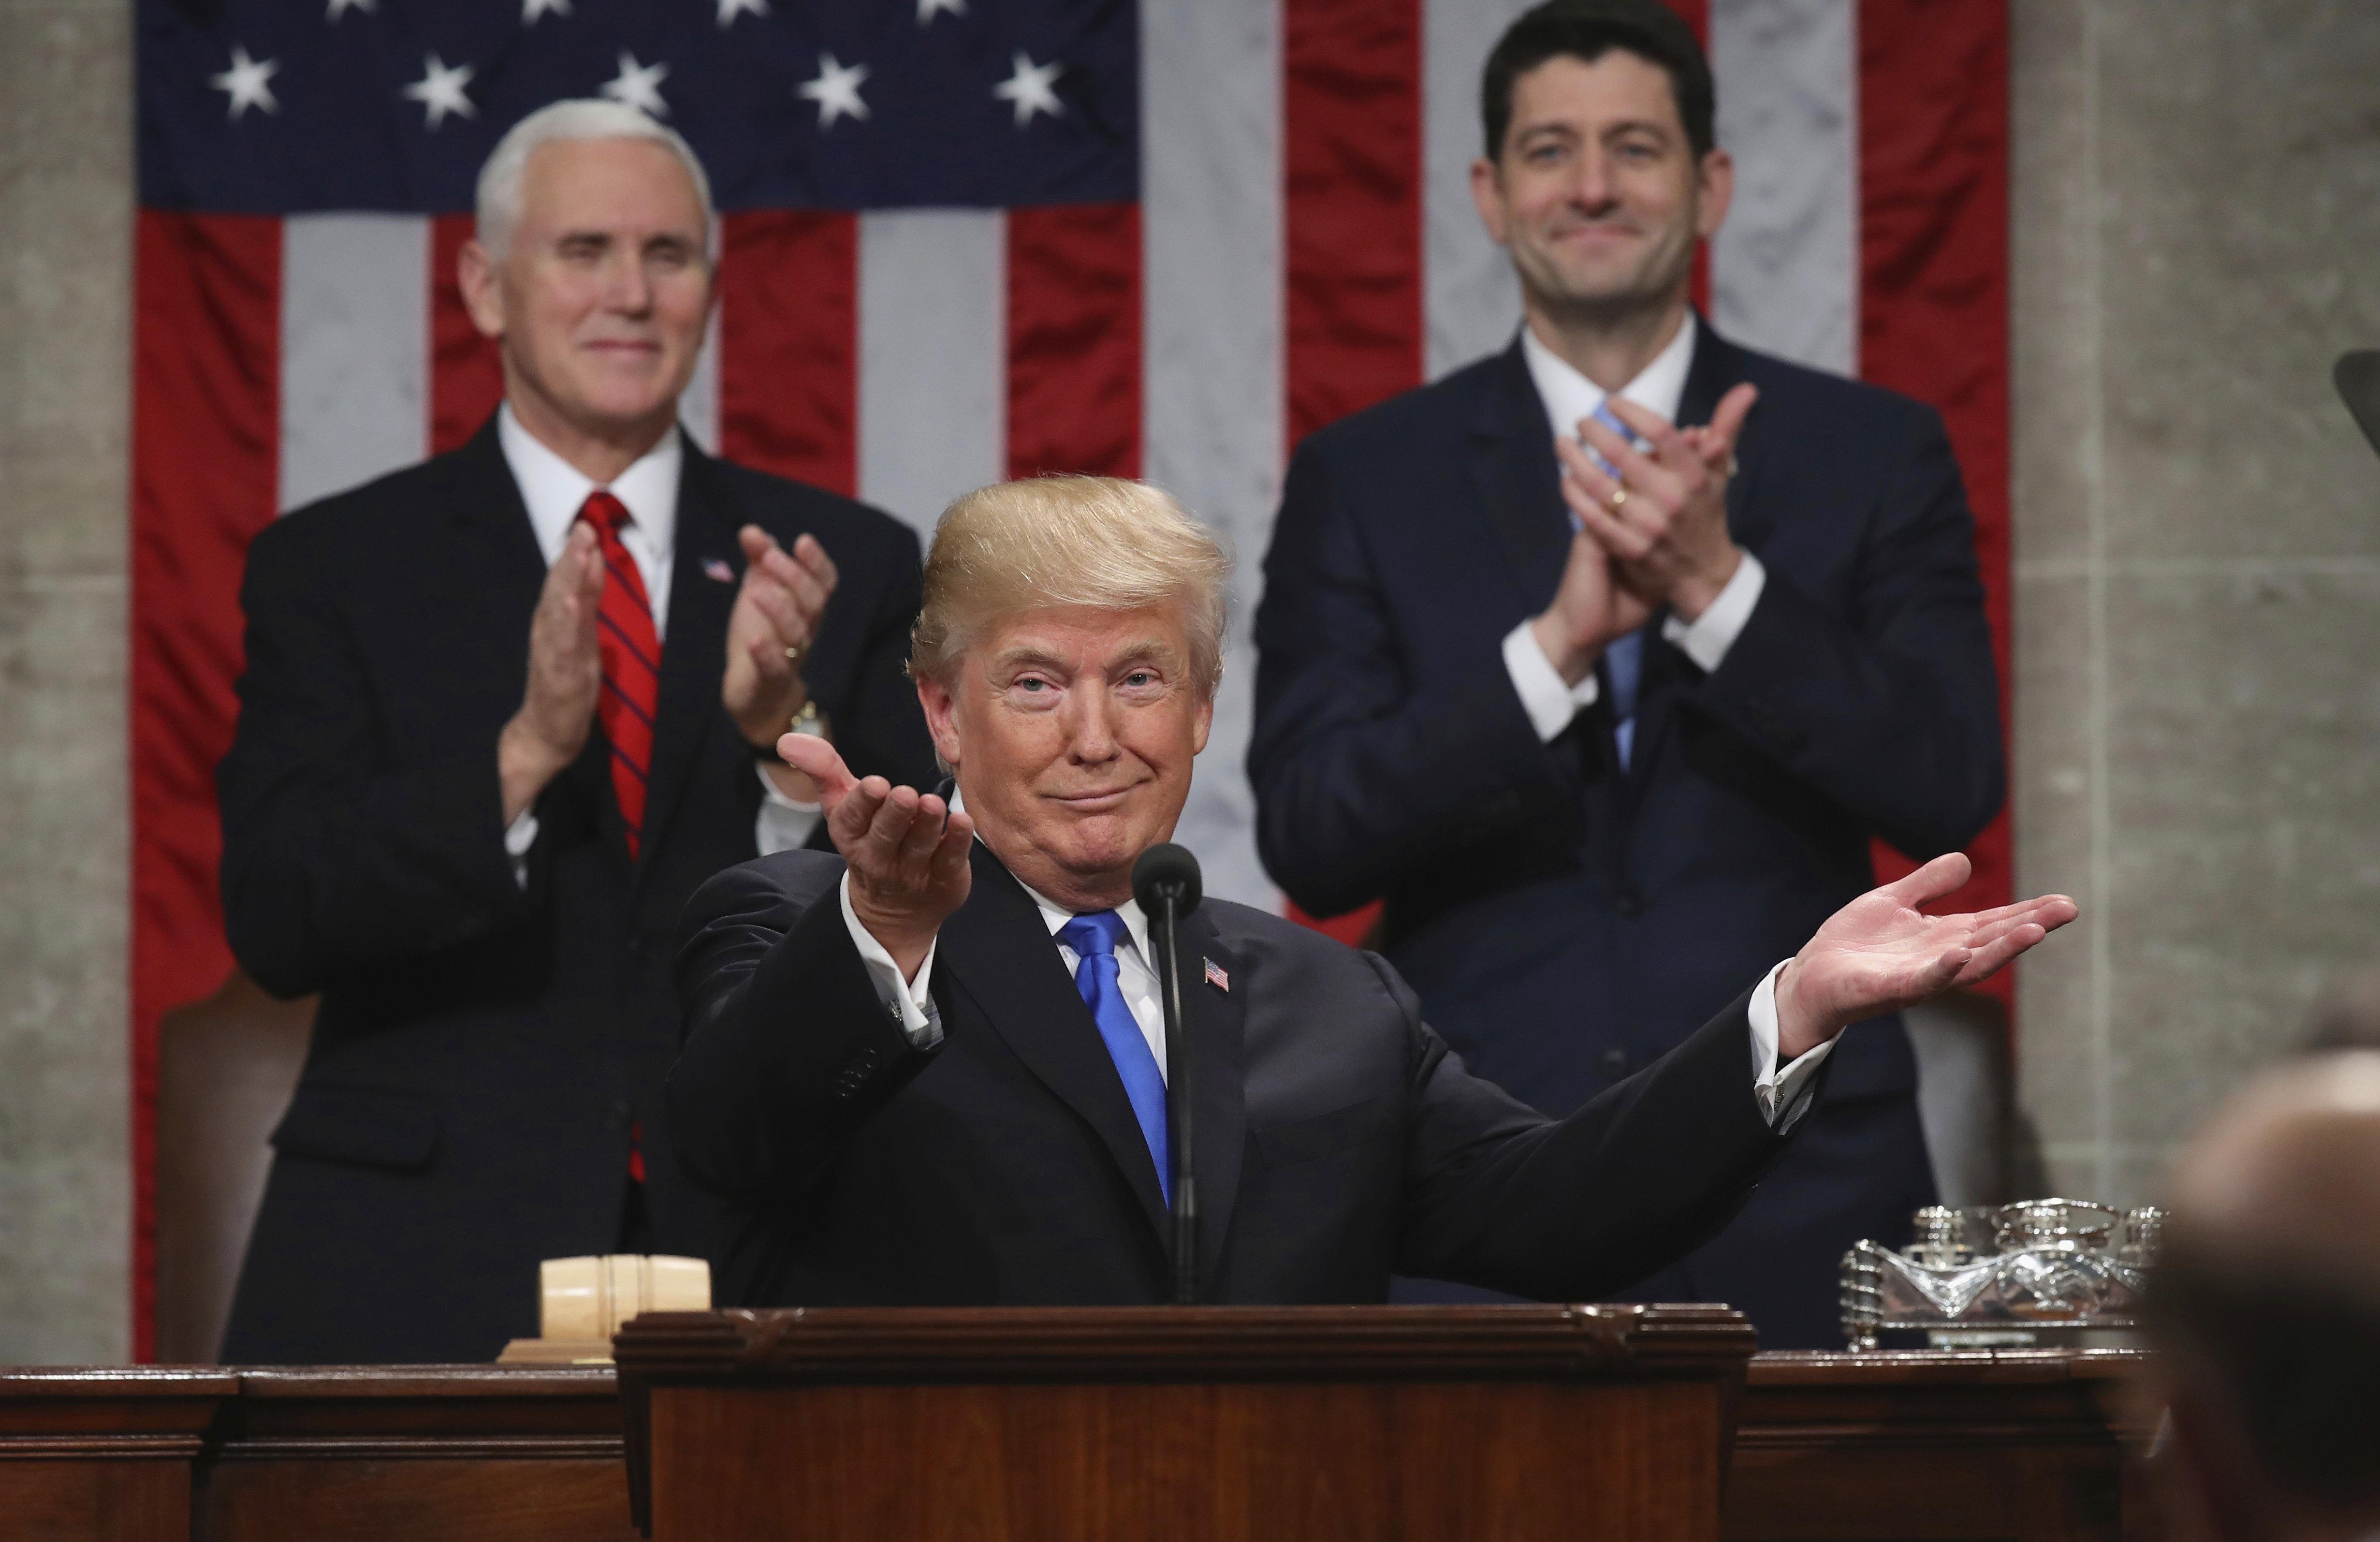 Donald Trump To Meet North Korea's Kim Jong Un Next Month In Second